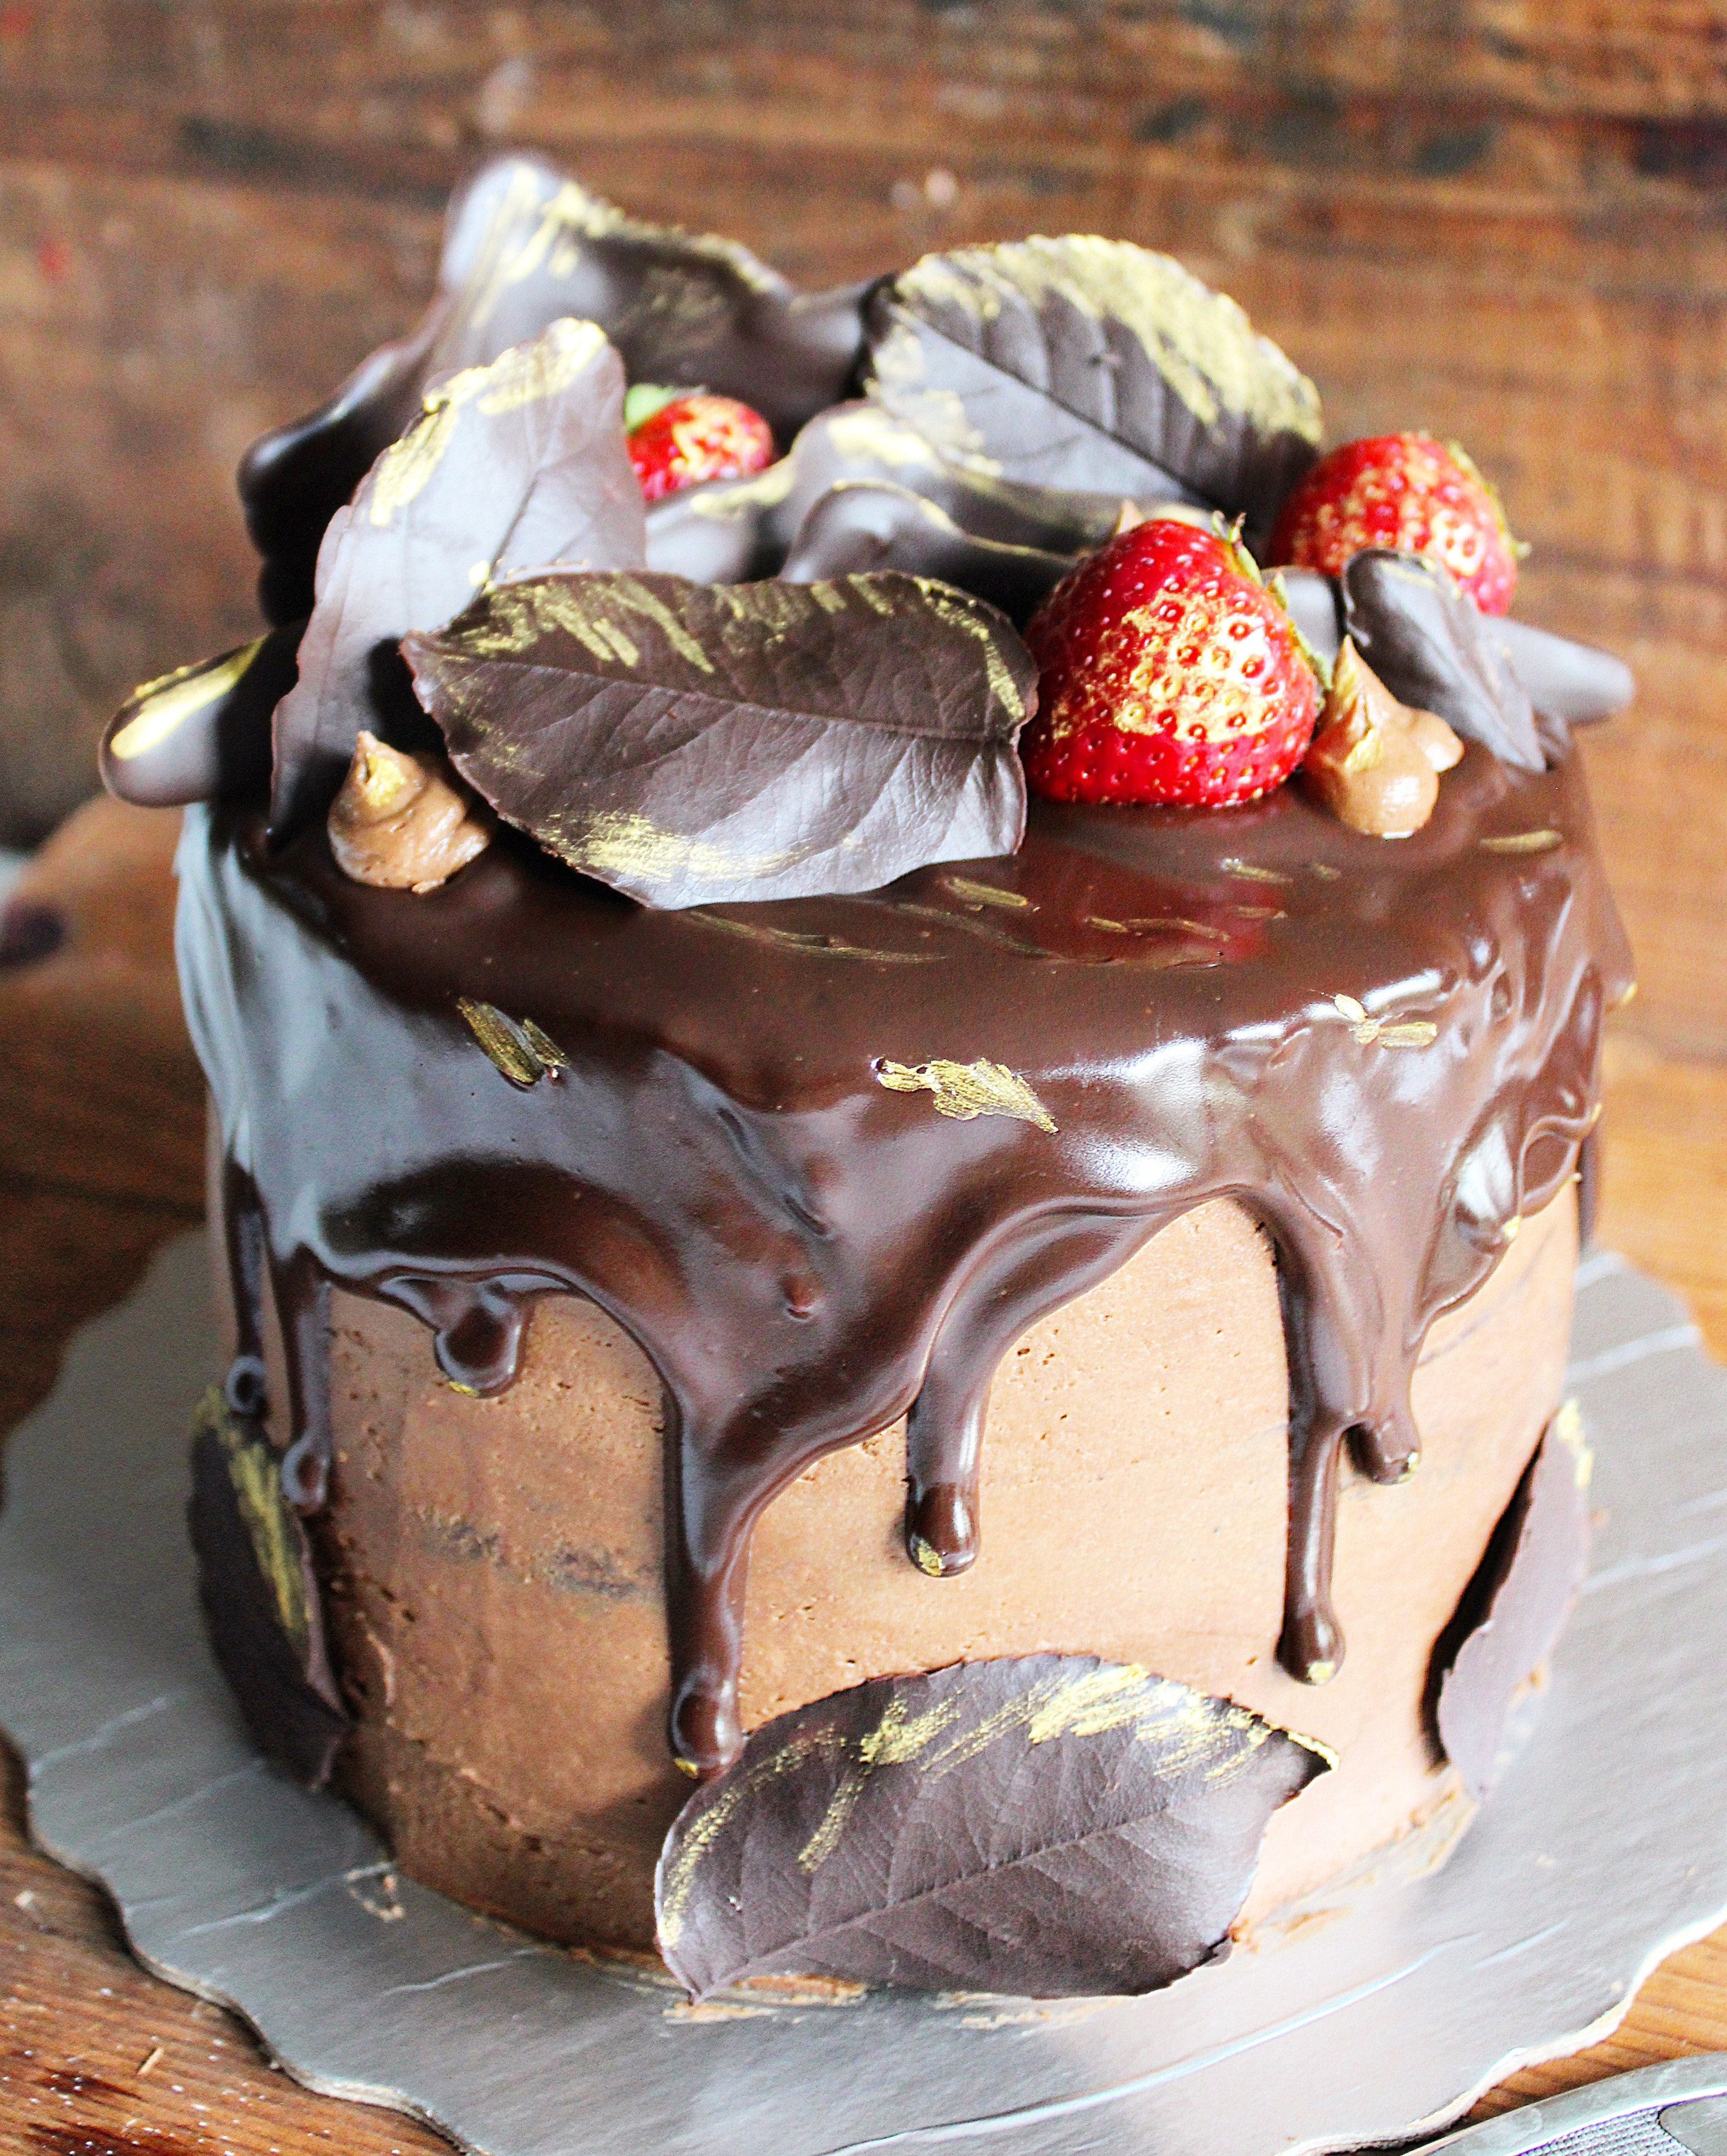 Best Chocolate Cake Best Chocolate Cake